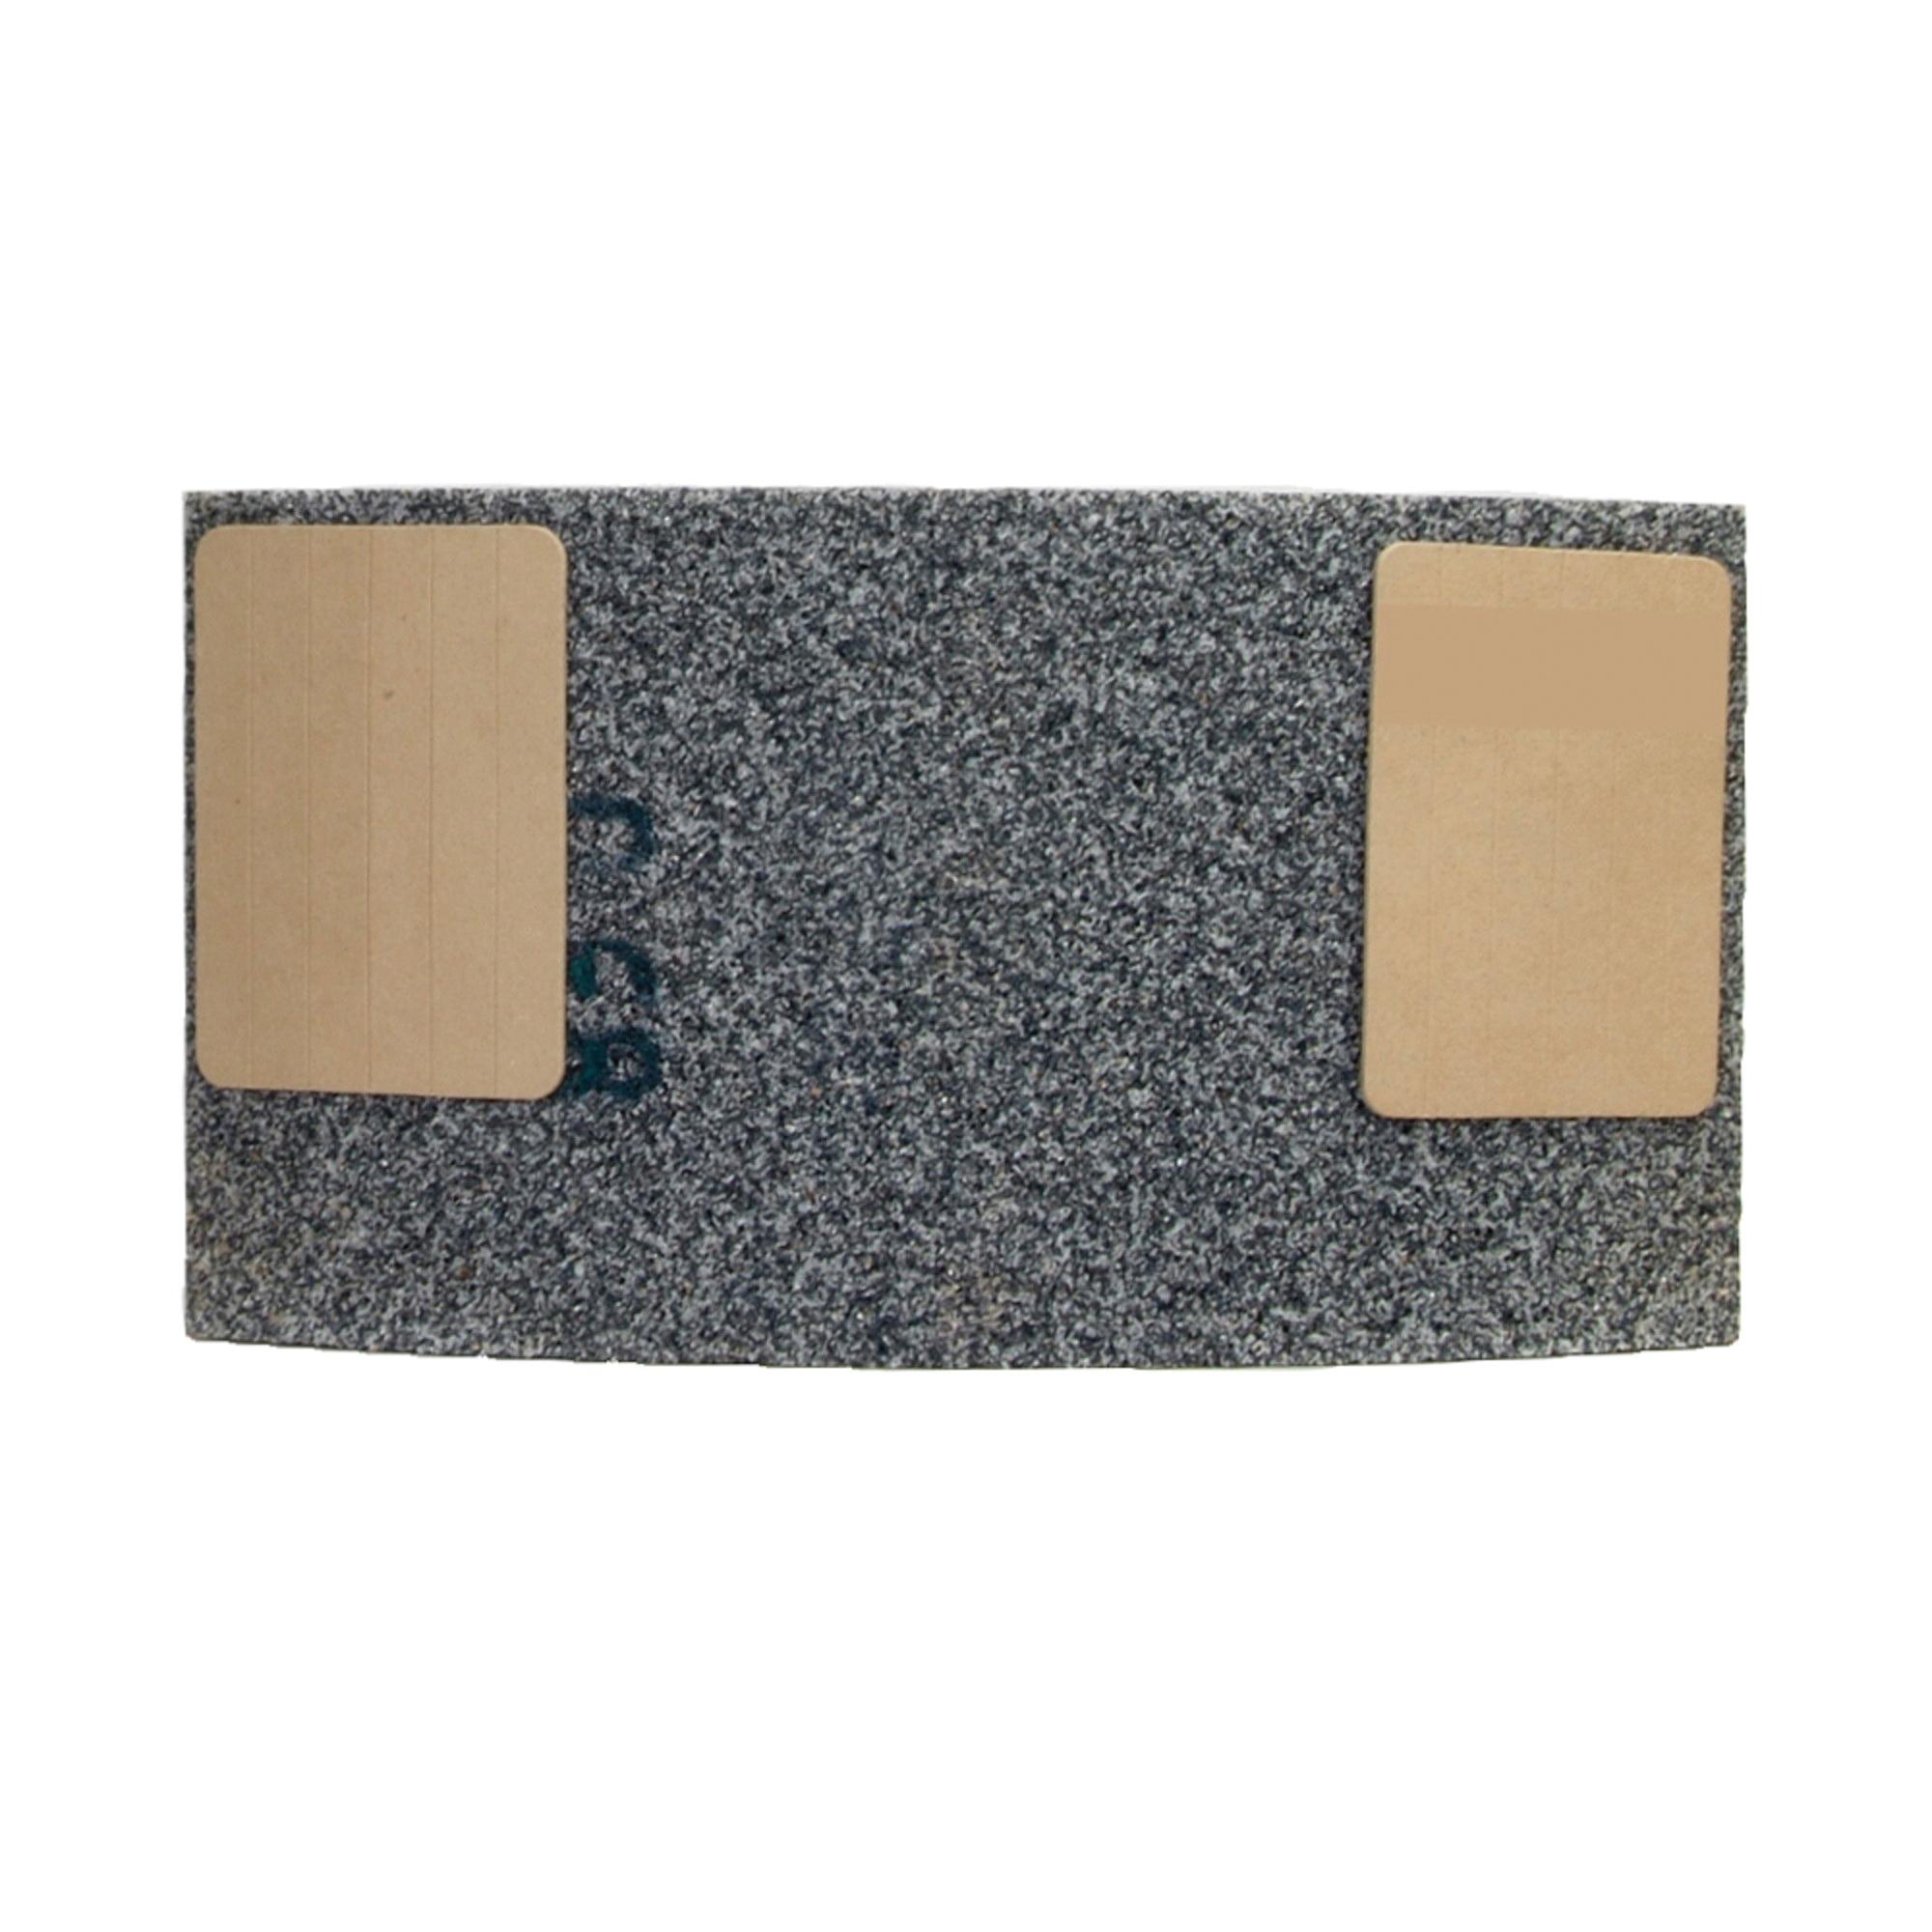 Norton® Gemini® 69936699706 53A Type 31 Surface Grinding Segment, 6 in H x 11-1/4 in W x 2-1/4 in THK, 30 Grit, Aluminum Oxide Abrasive